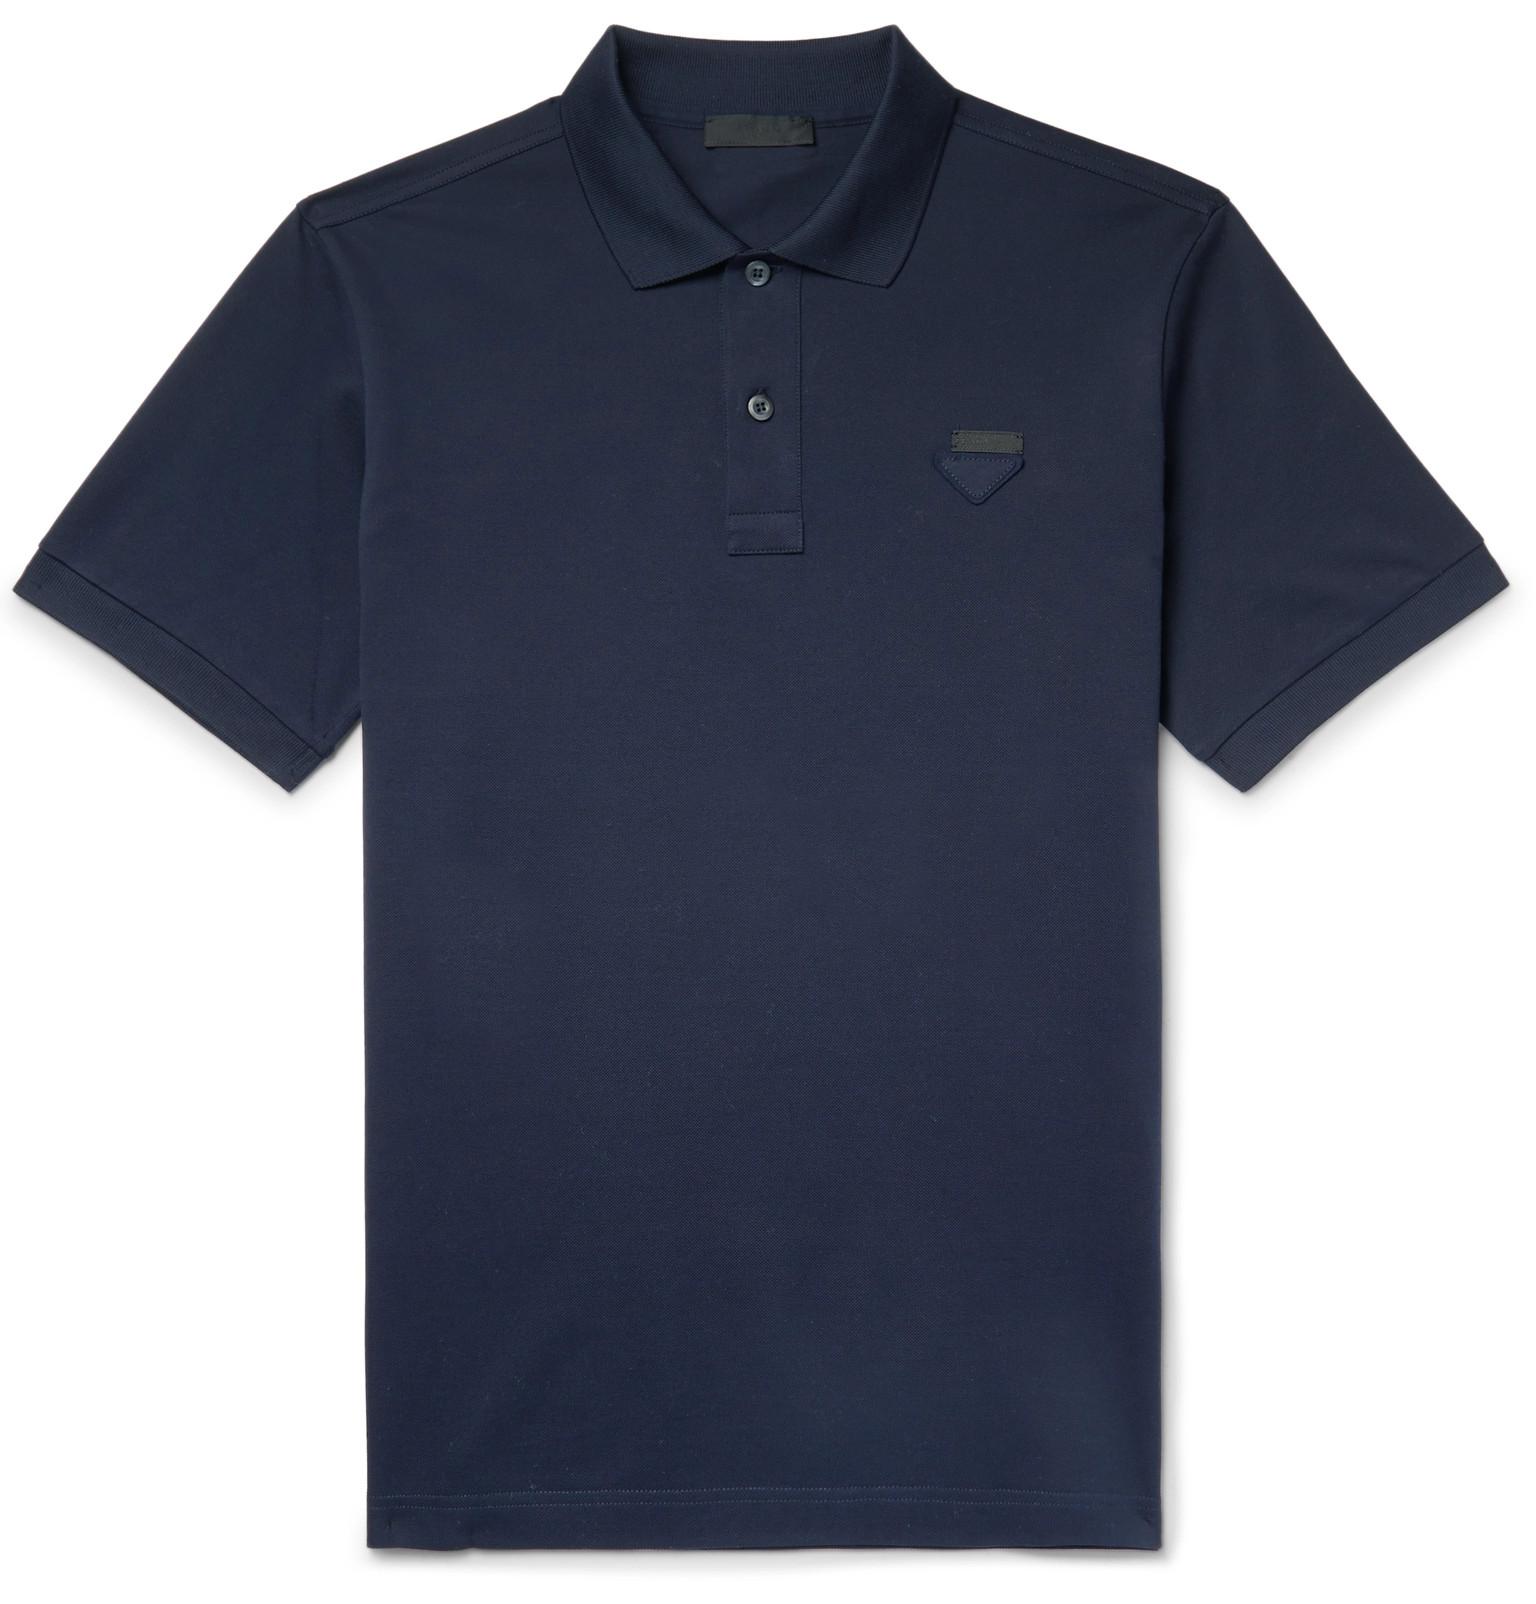 518ff5f696a96 Prada Polo Shirt Size